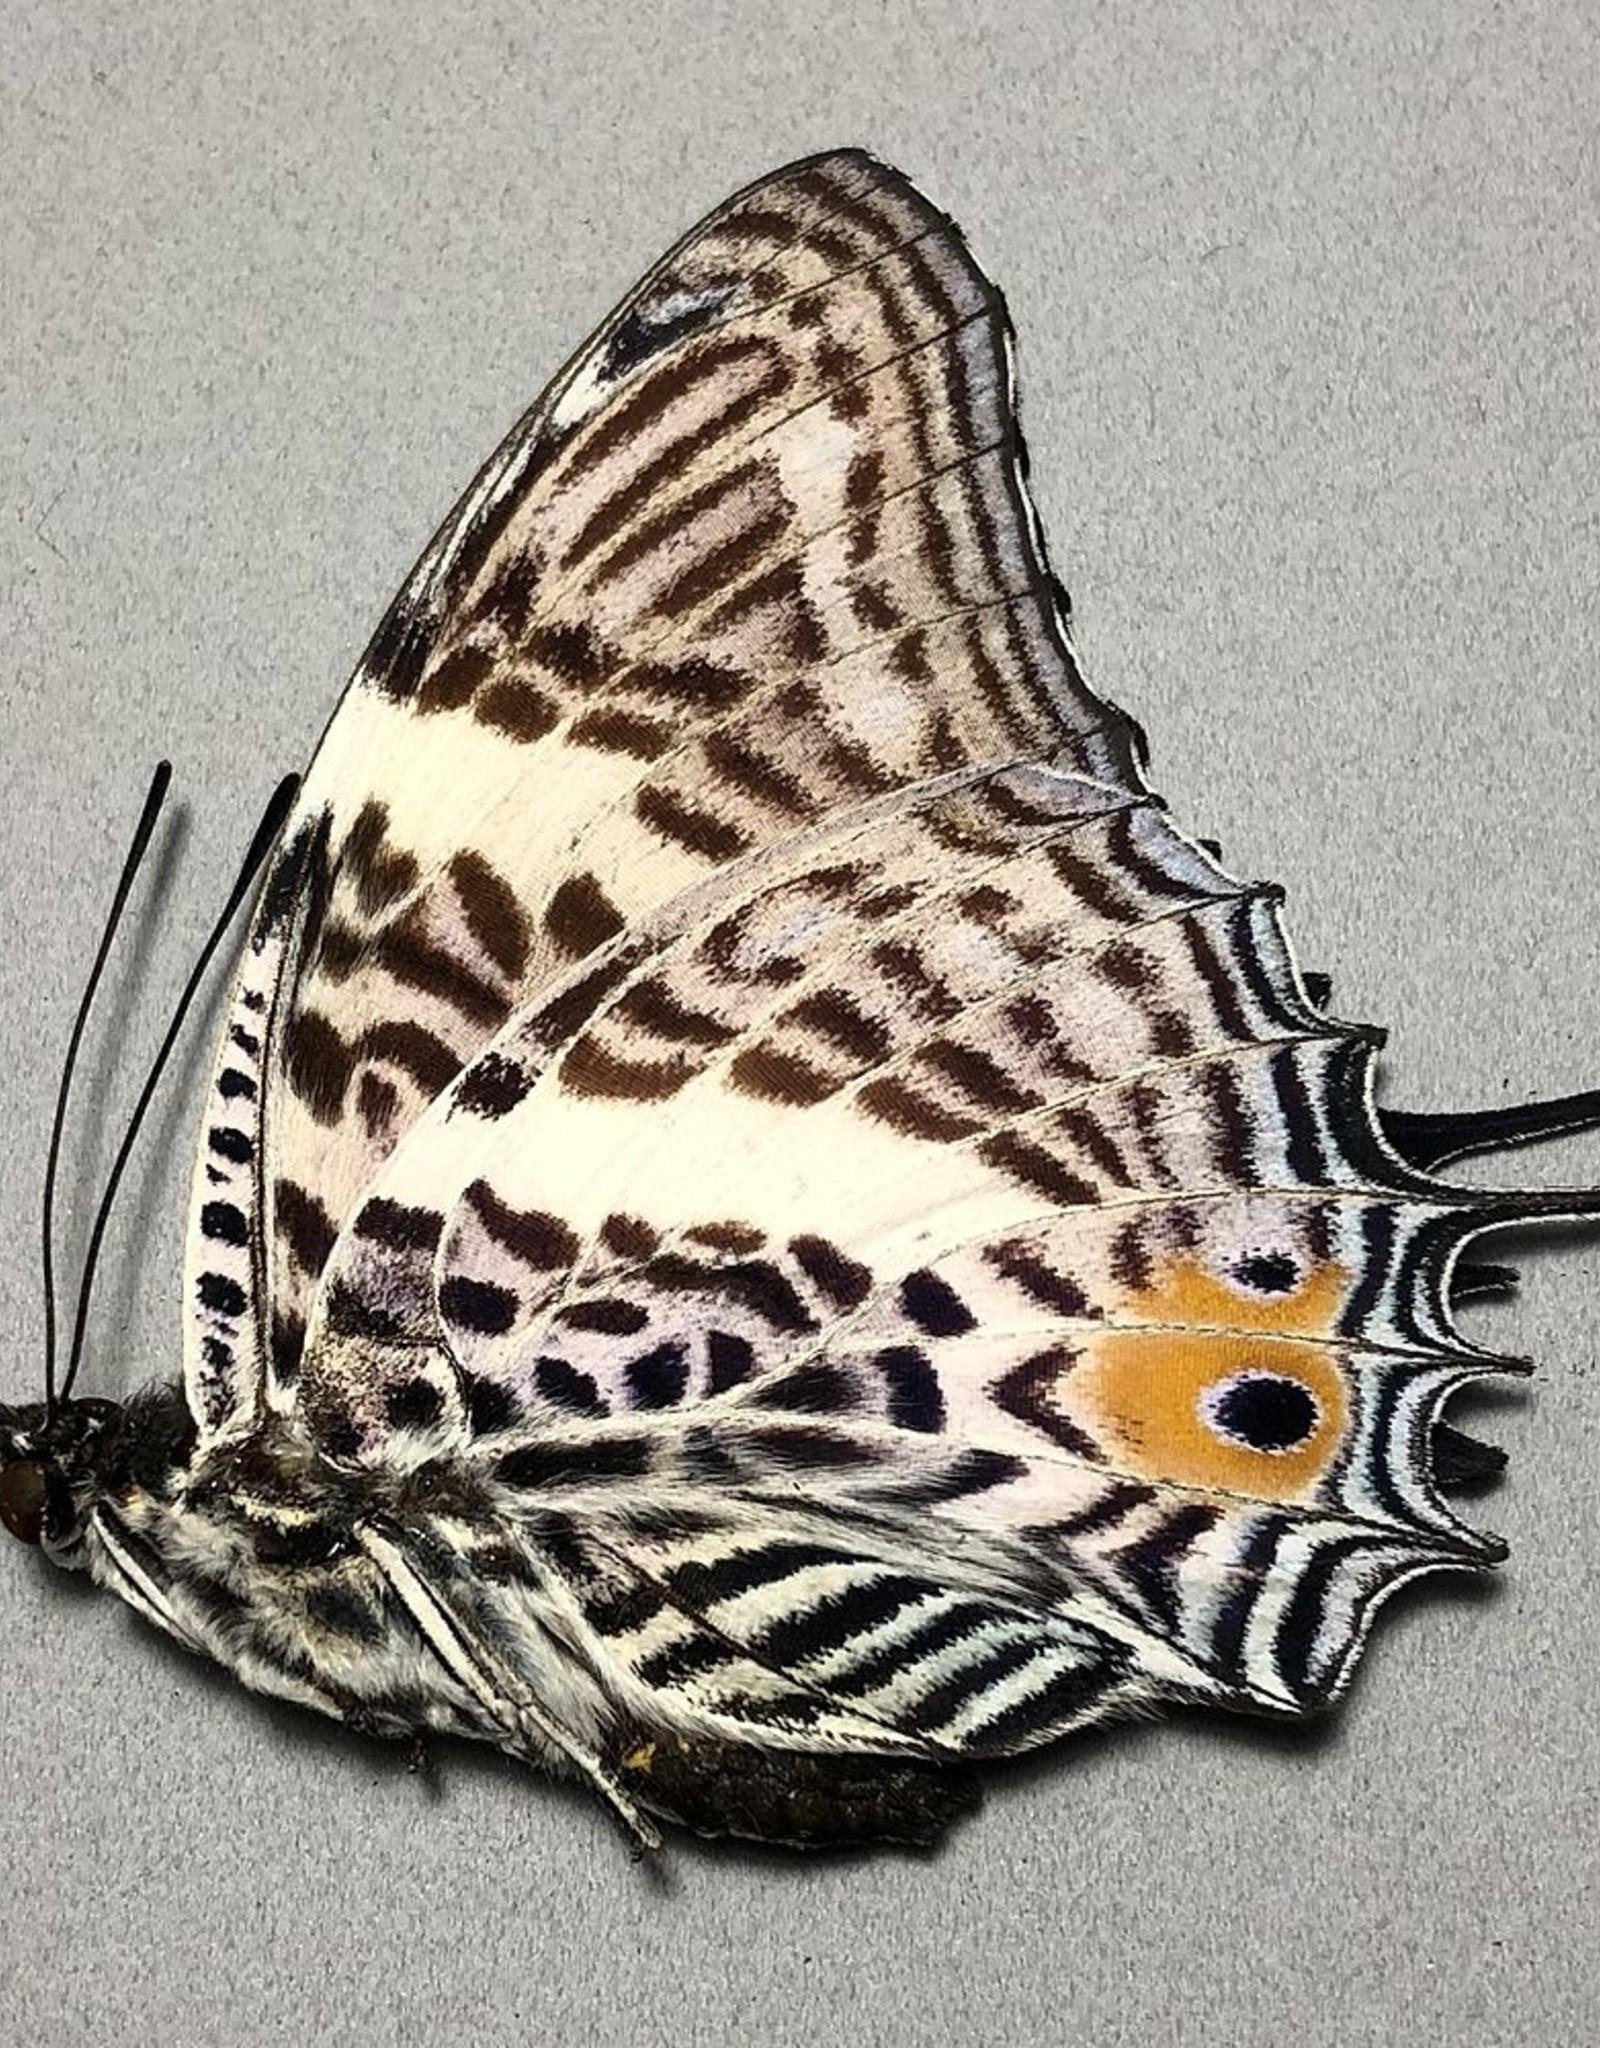 Baeotus (Megistanis) baeotus M A1 Peru